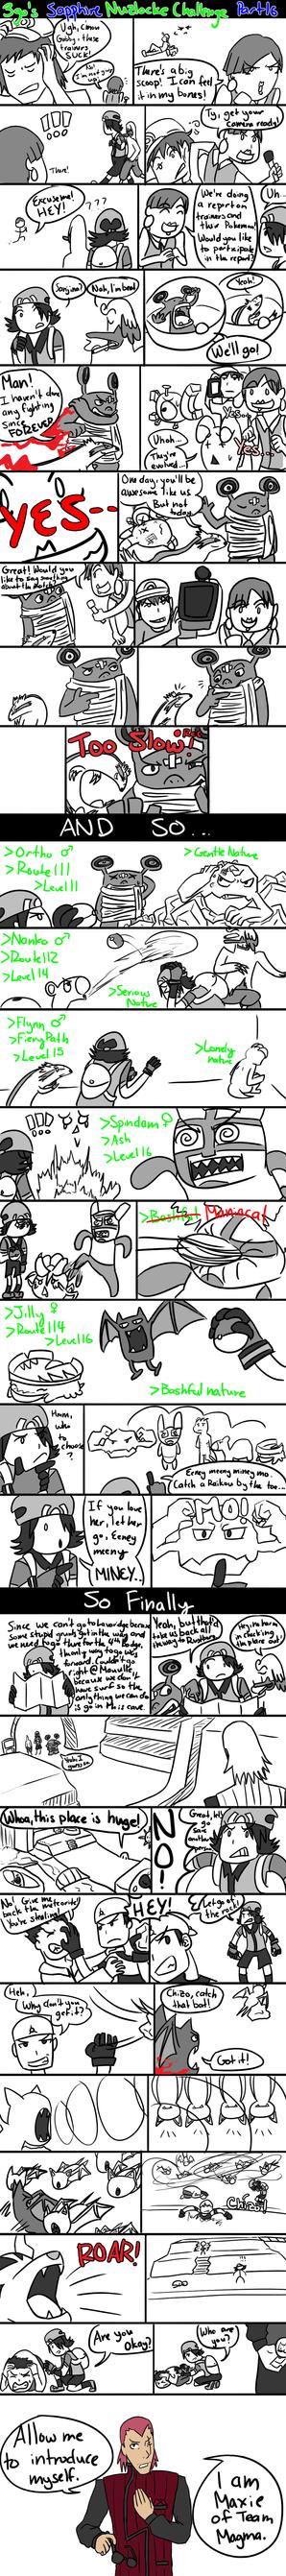 3go's Nuzlocke Page 16 by 3nigmatic-3go